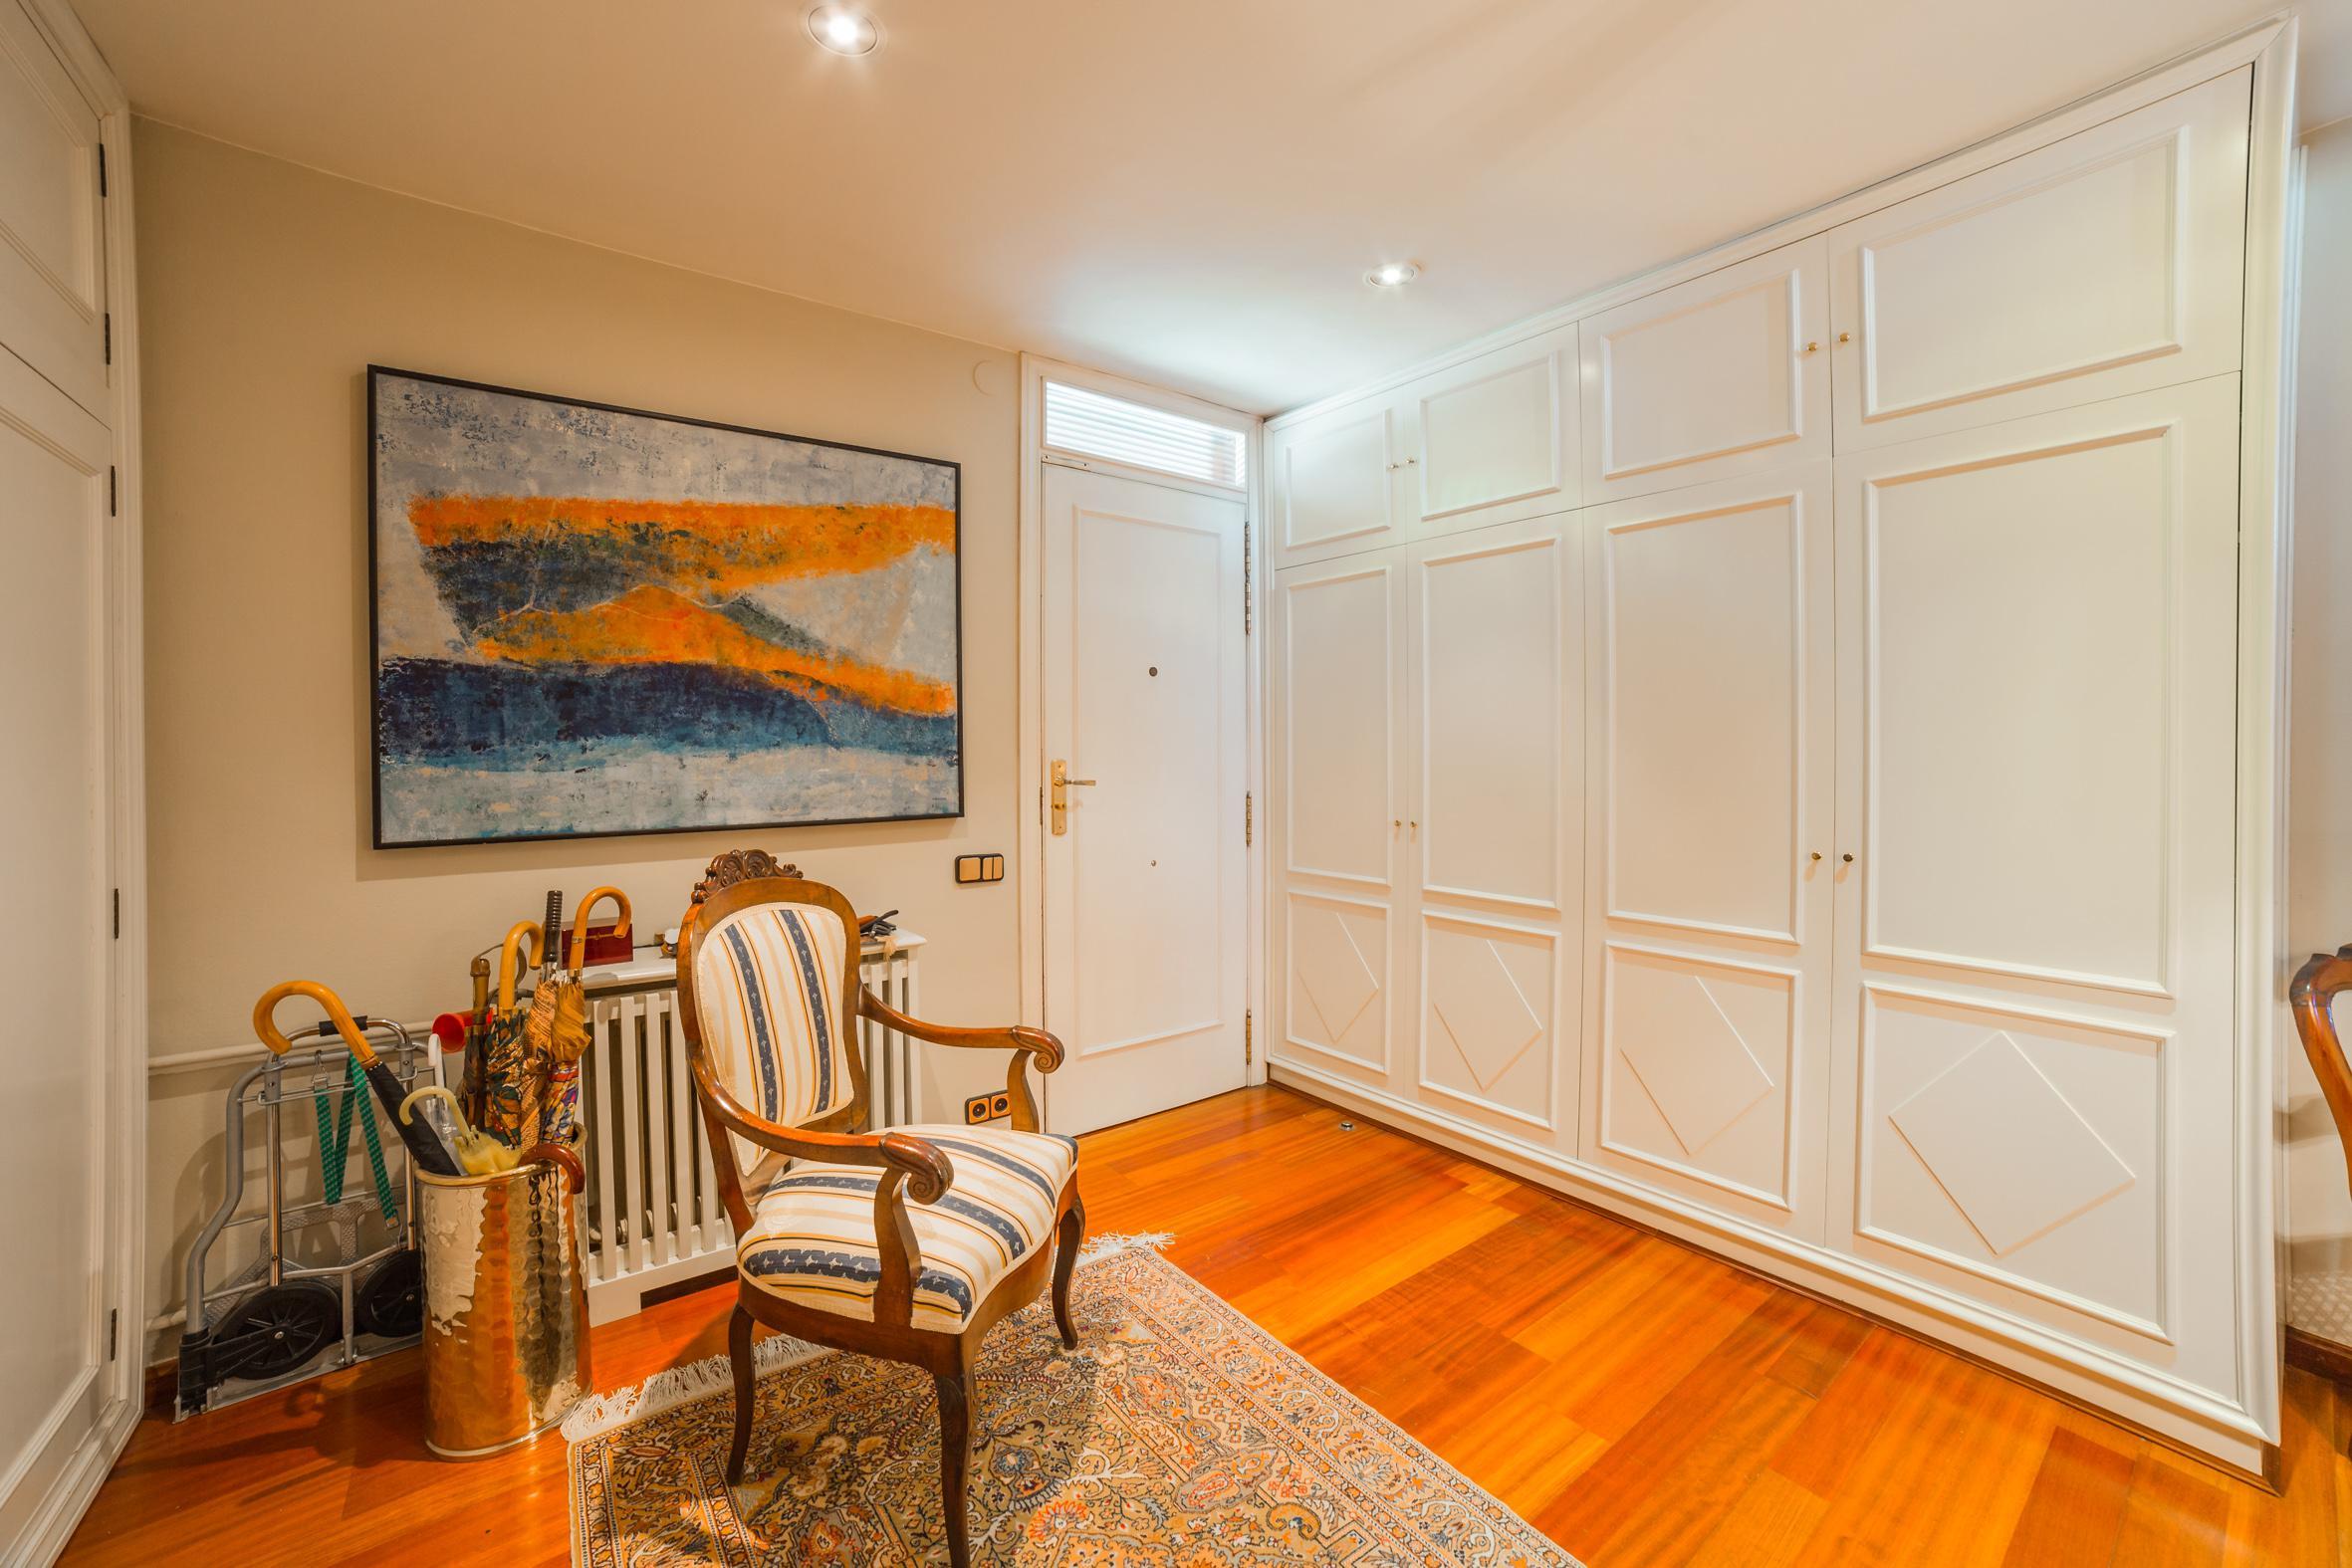 253515 Apartamento en venta en Sarrià-Sant Gervasi, Sant Gervasi-Galvany 8